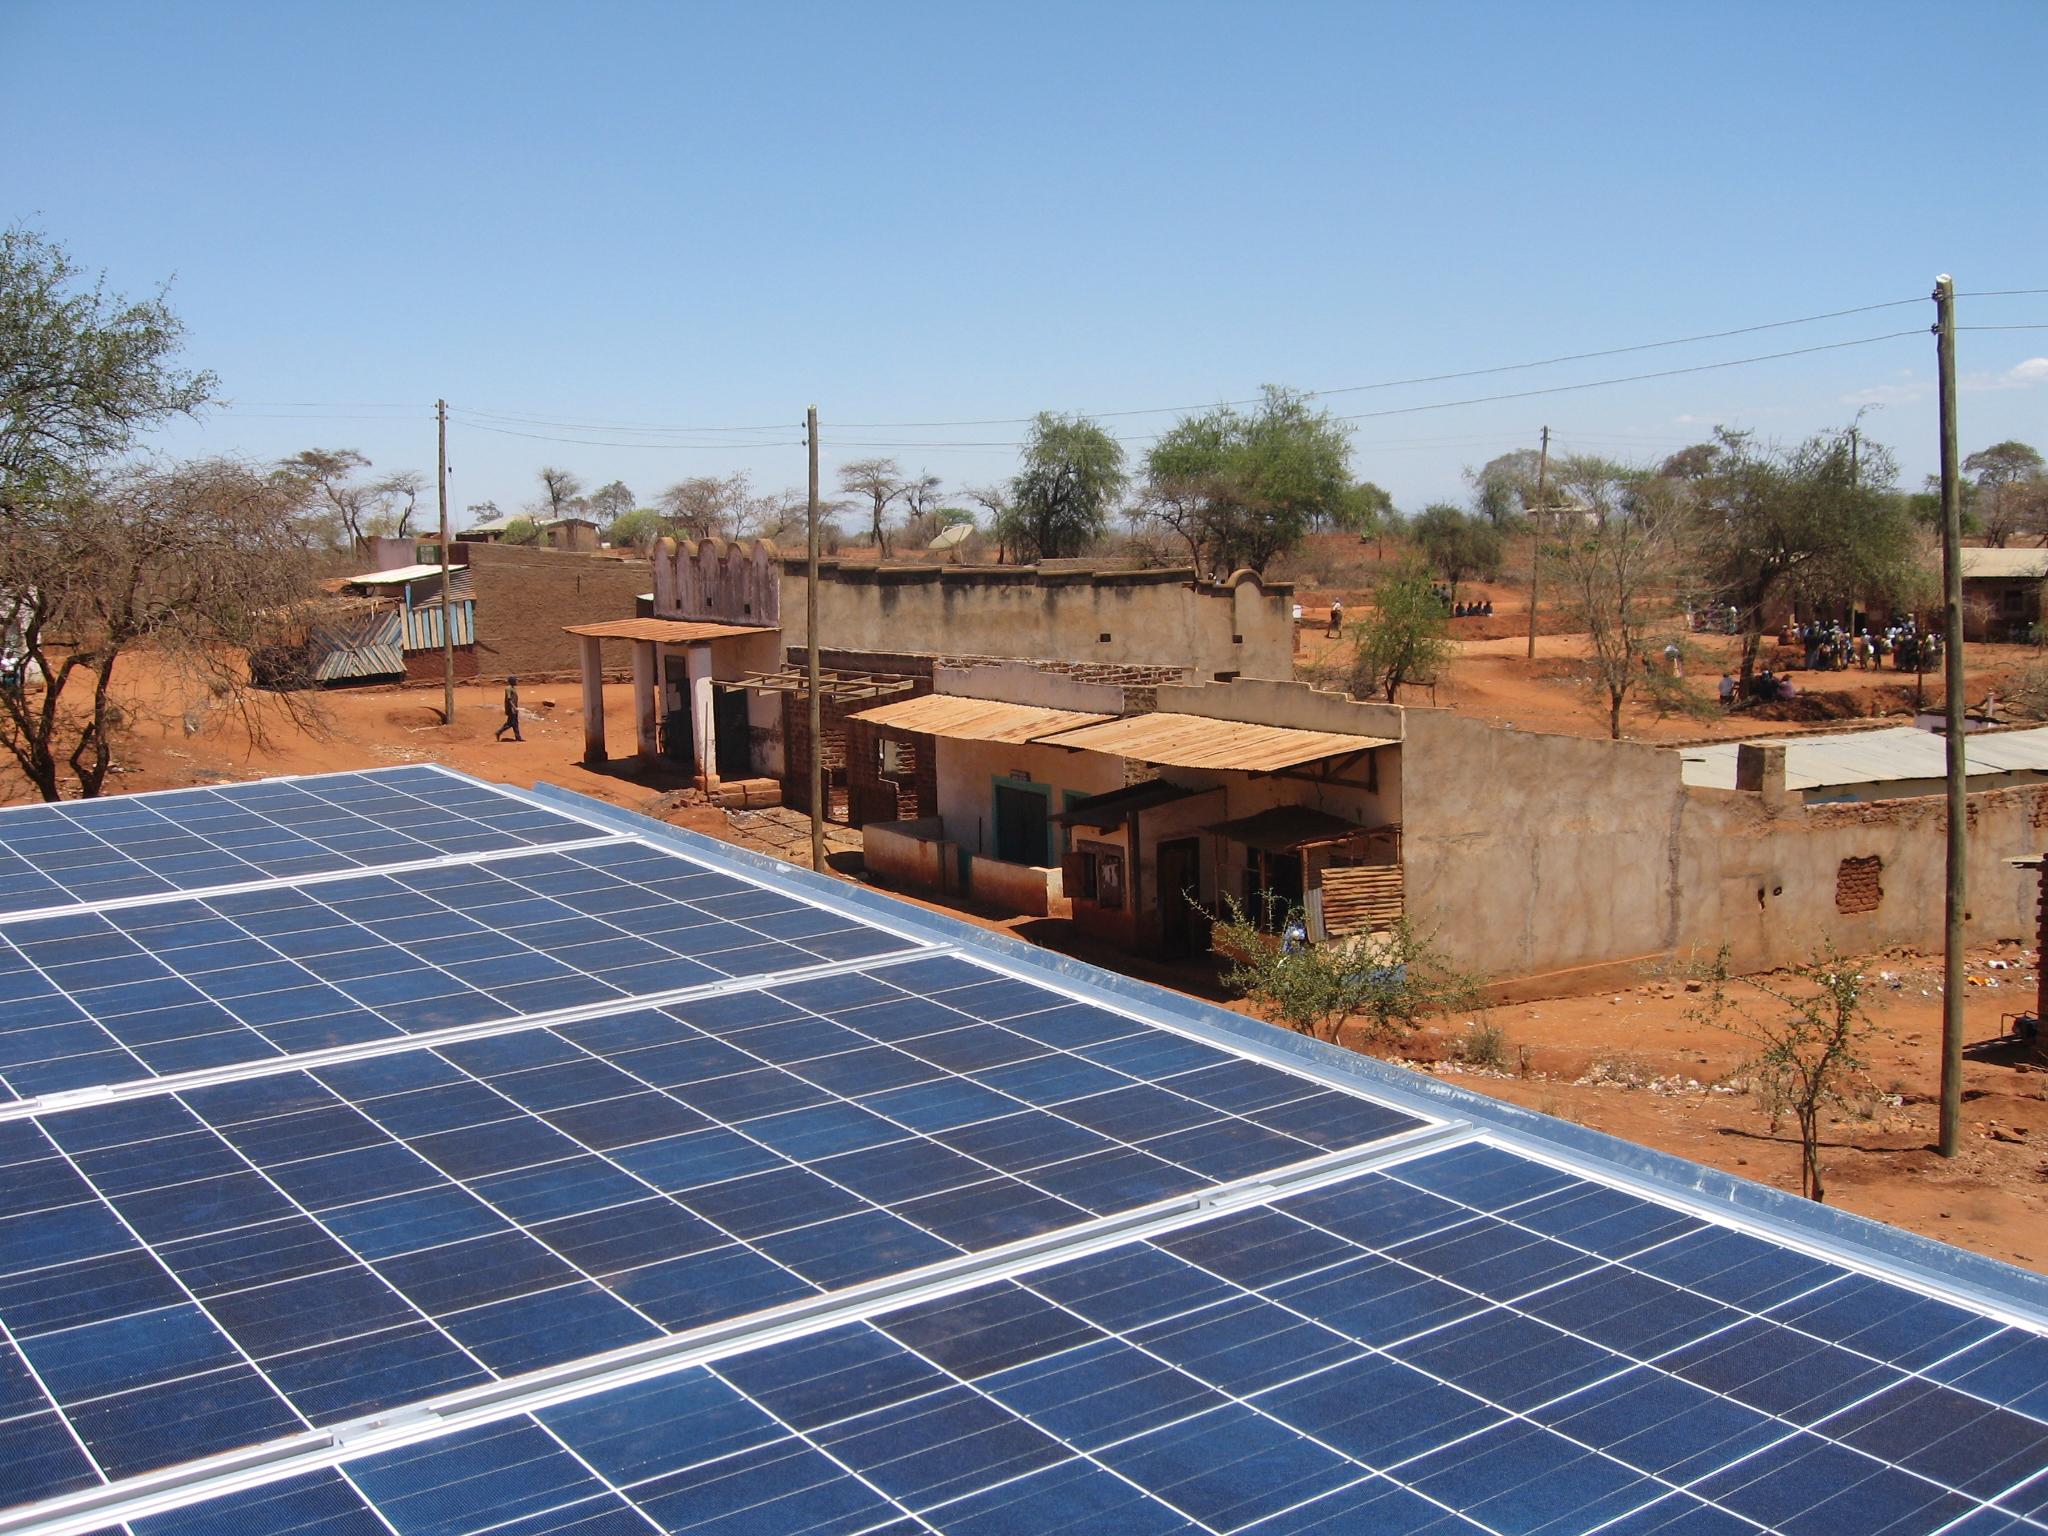 Kitonyoni solar power plant